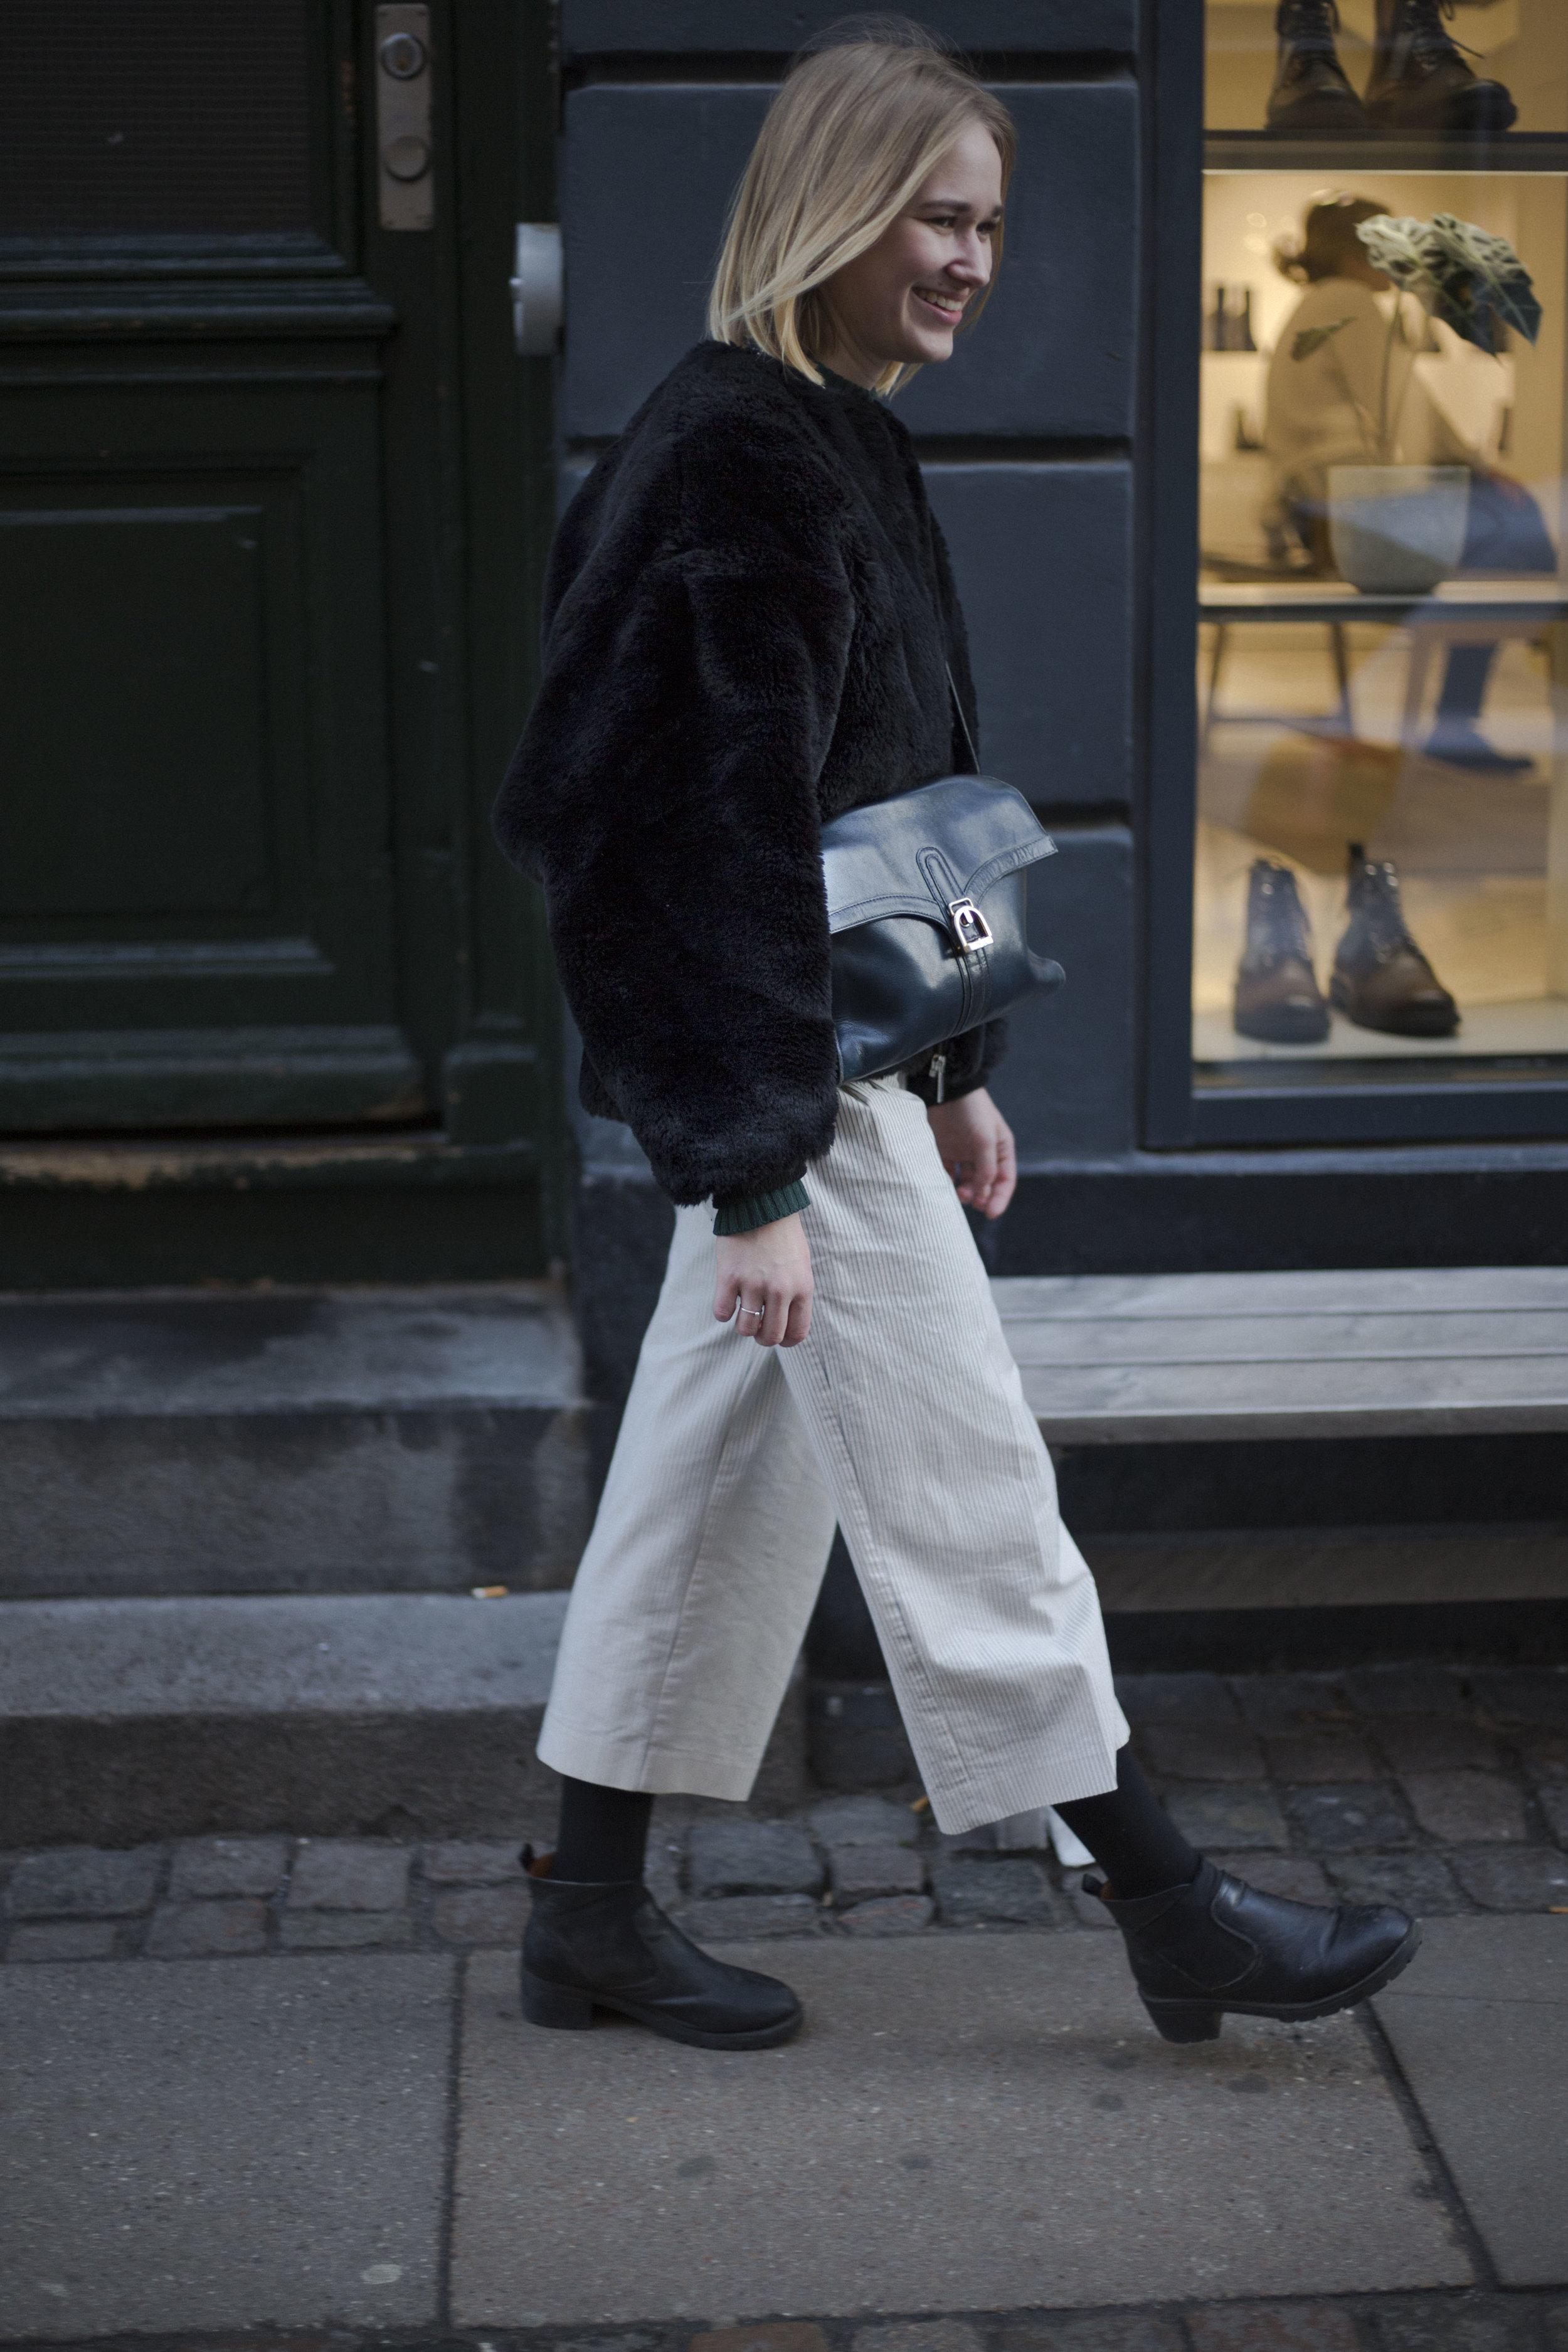 copenhagen-denmark-fashion-streetstyle-blog-onthestreets-thestreetland-portraits-fashionweek-layering-style-zarah-wonhundret-h&m